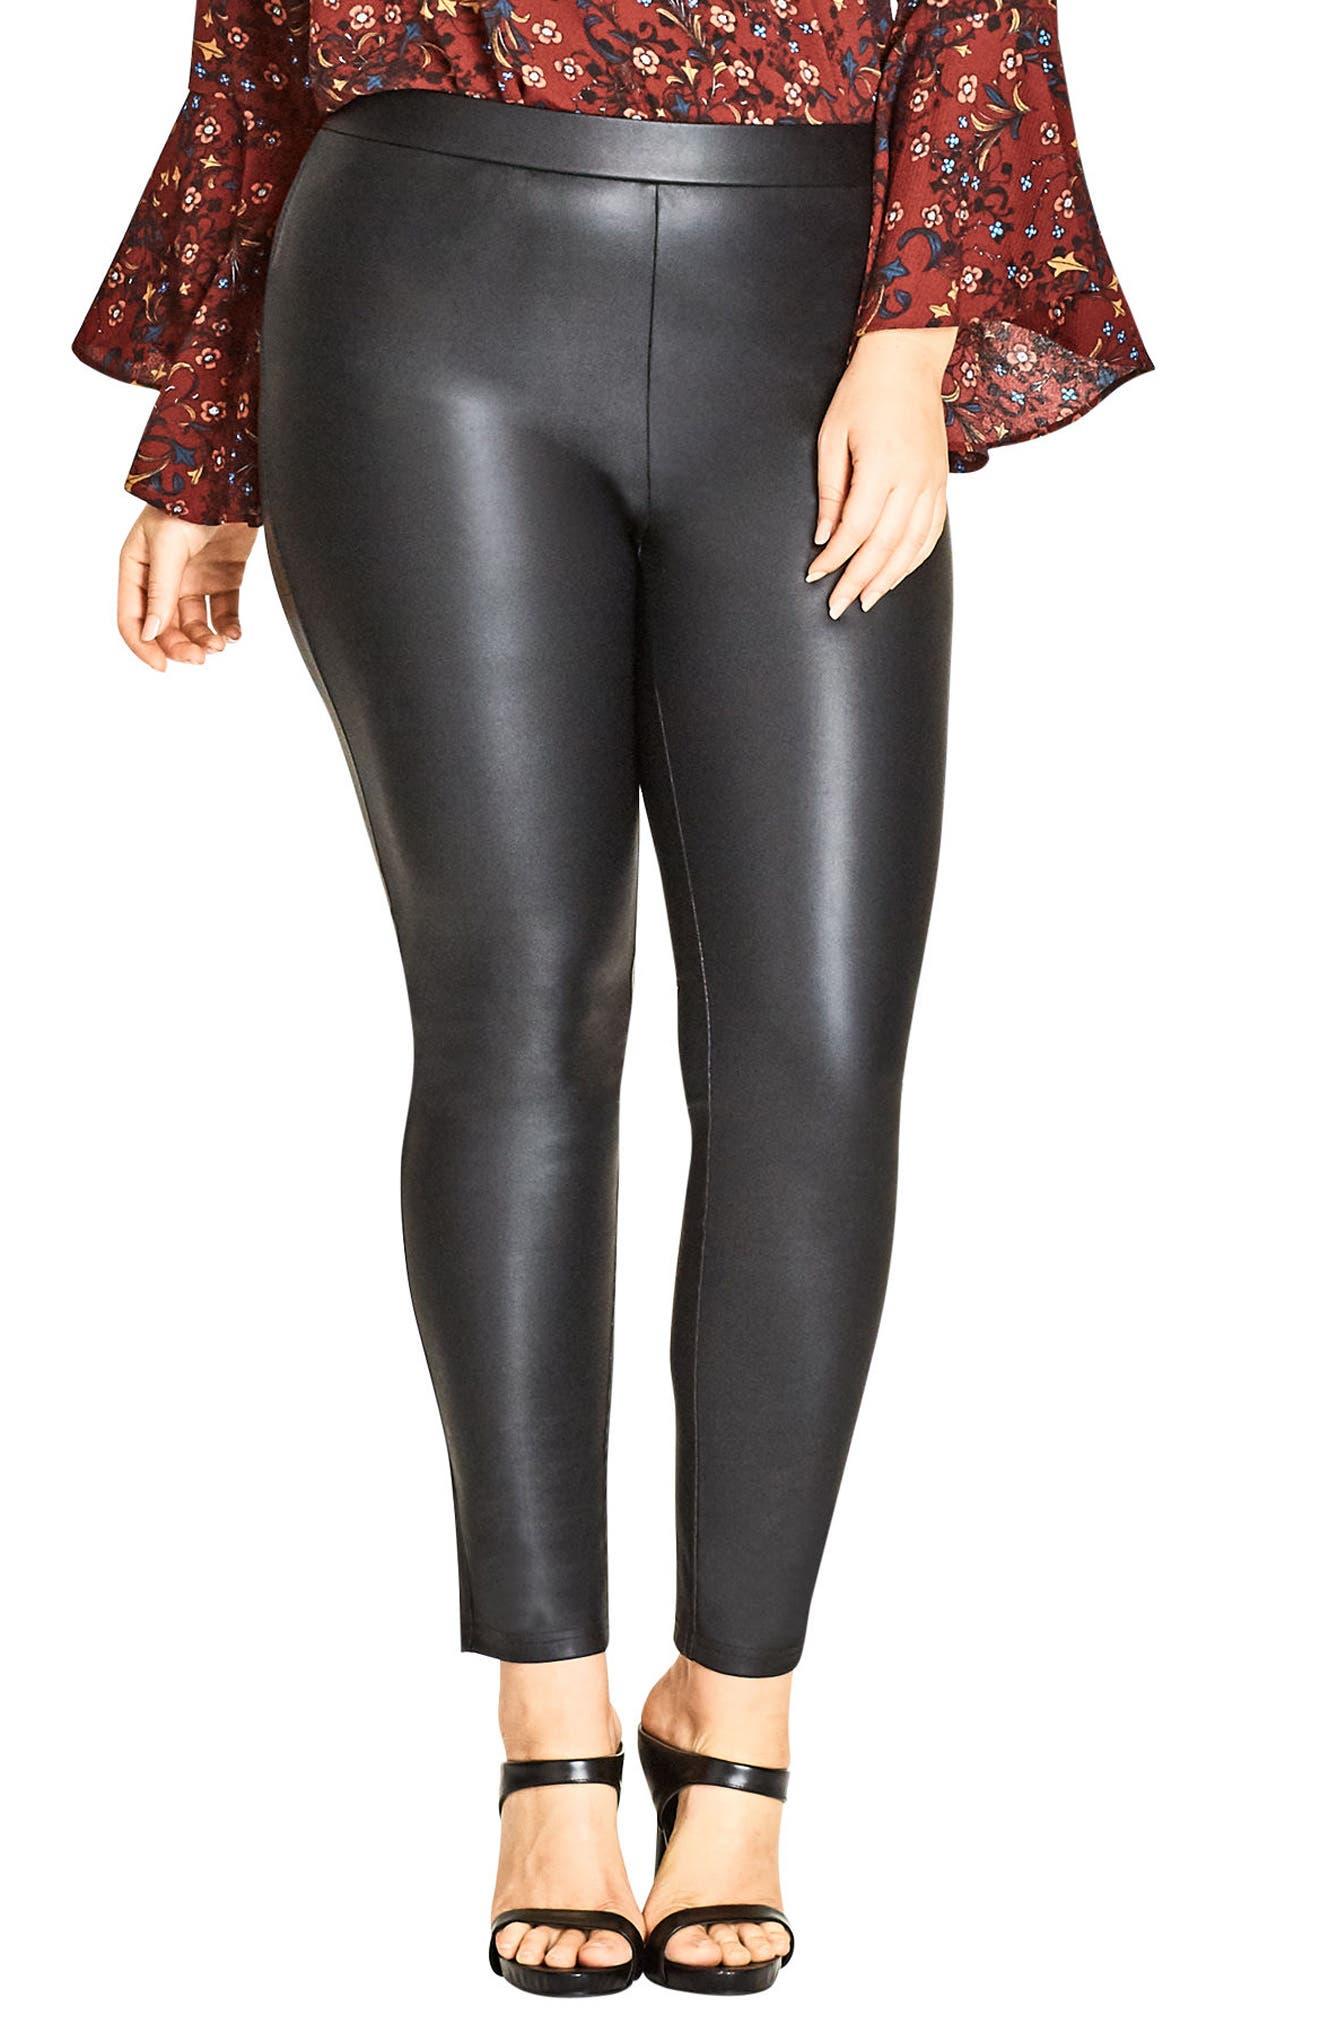 Main Image - City Chic Asha Wet Look Leggings (Plus Size)